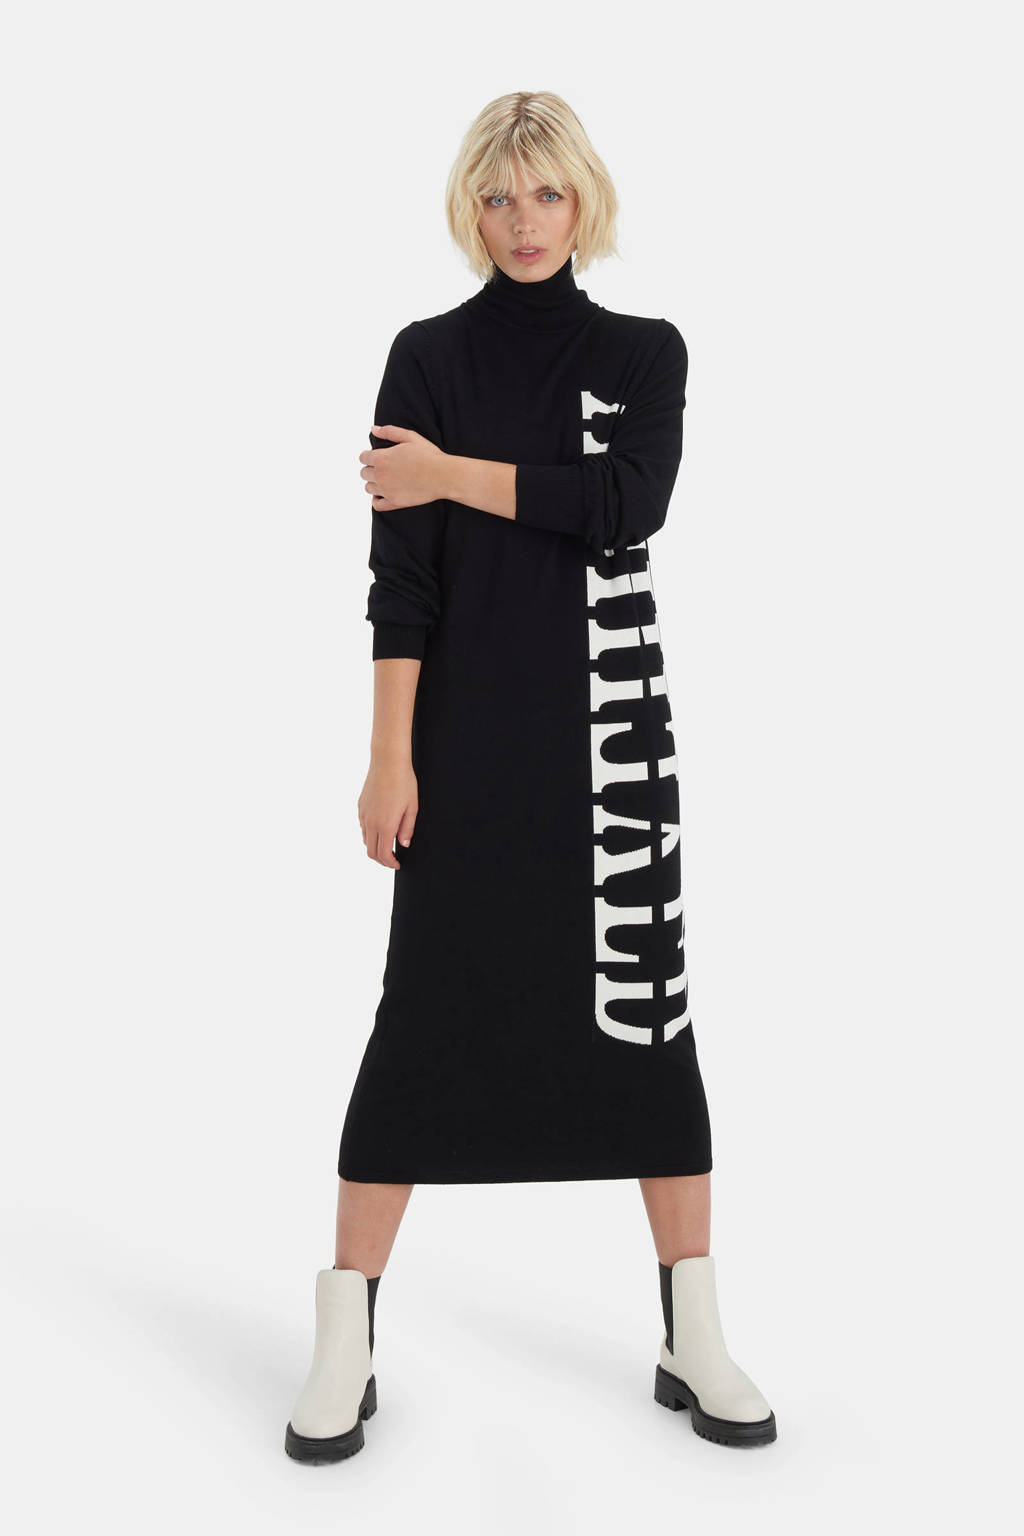 Shoeby Eksept gebreide jurk Kate met tekst zwart/wit, Zwart/wit